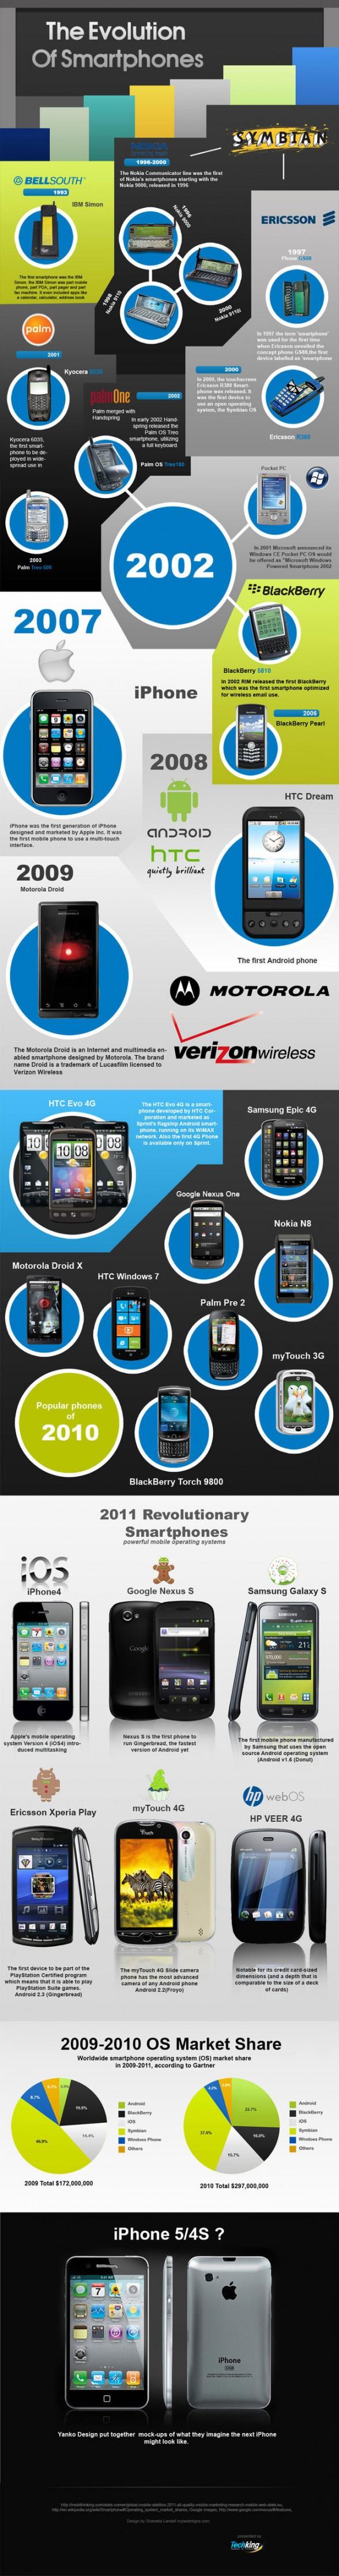 1310031652_la-evolucion-de-los-smartphones-infografia.jpg